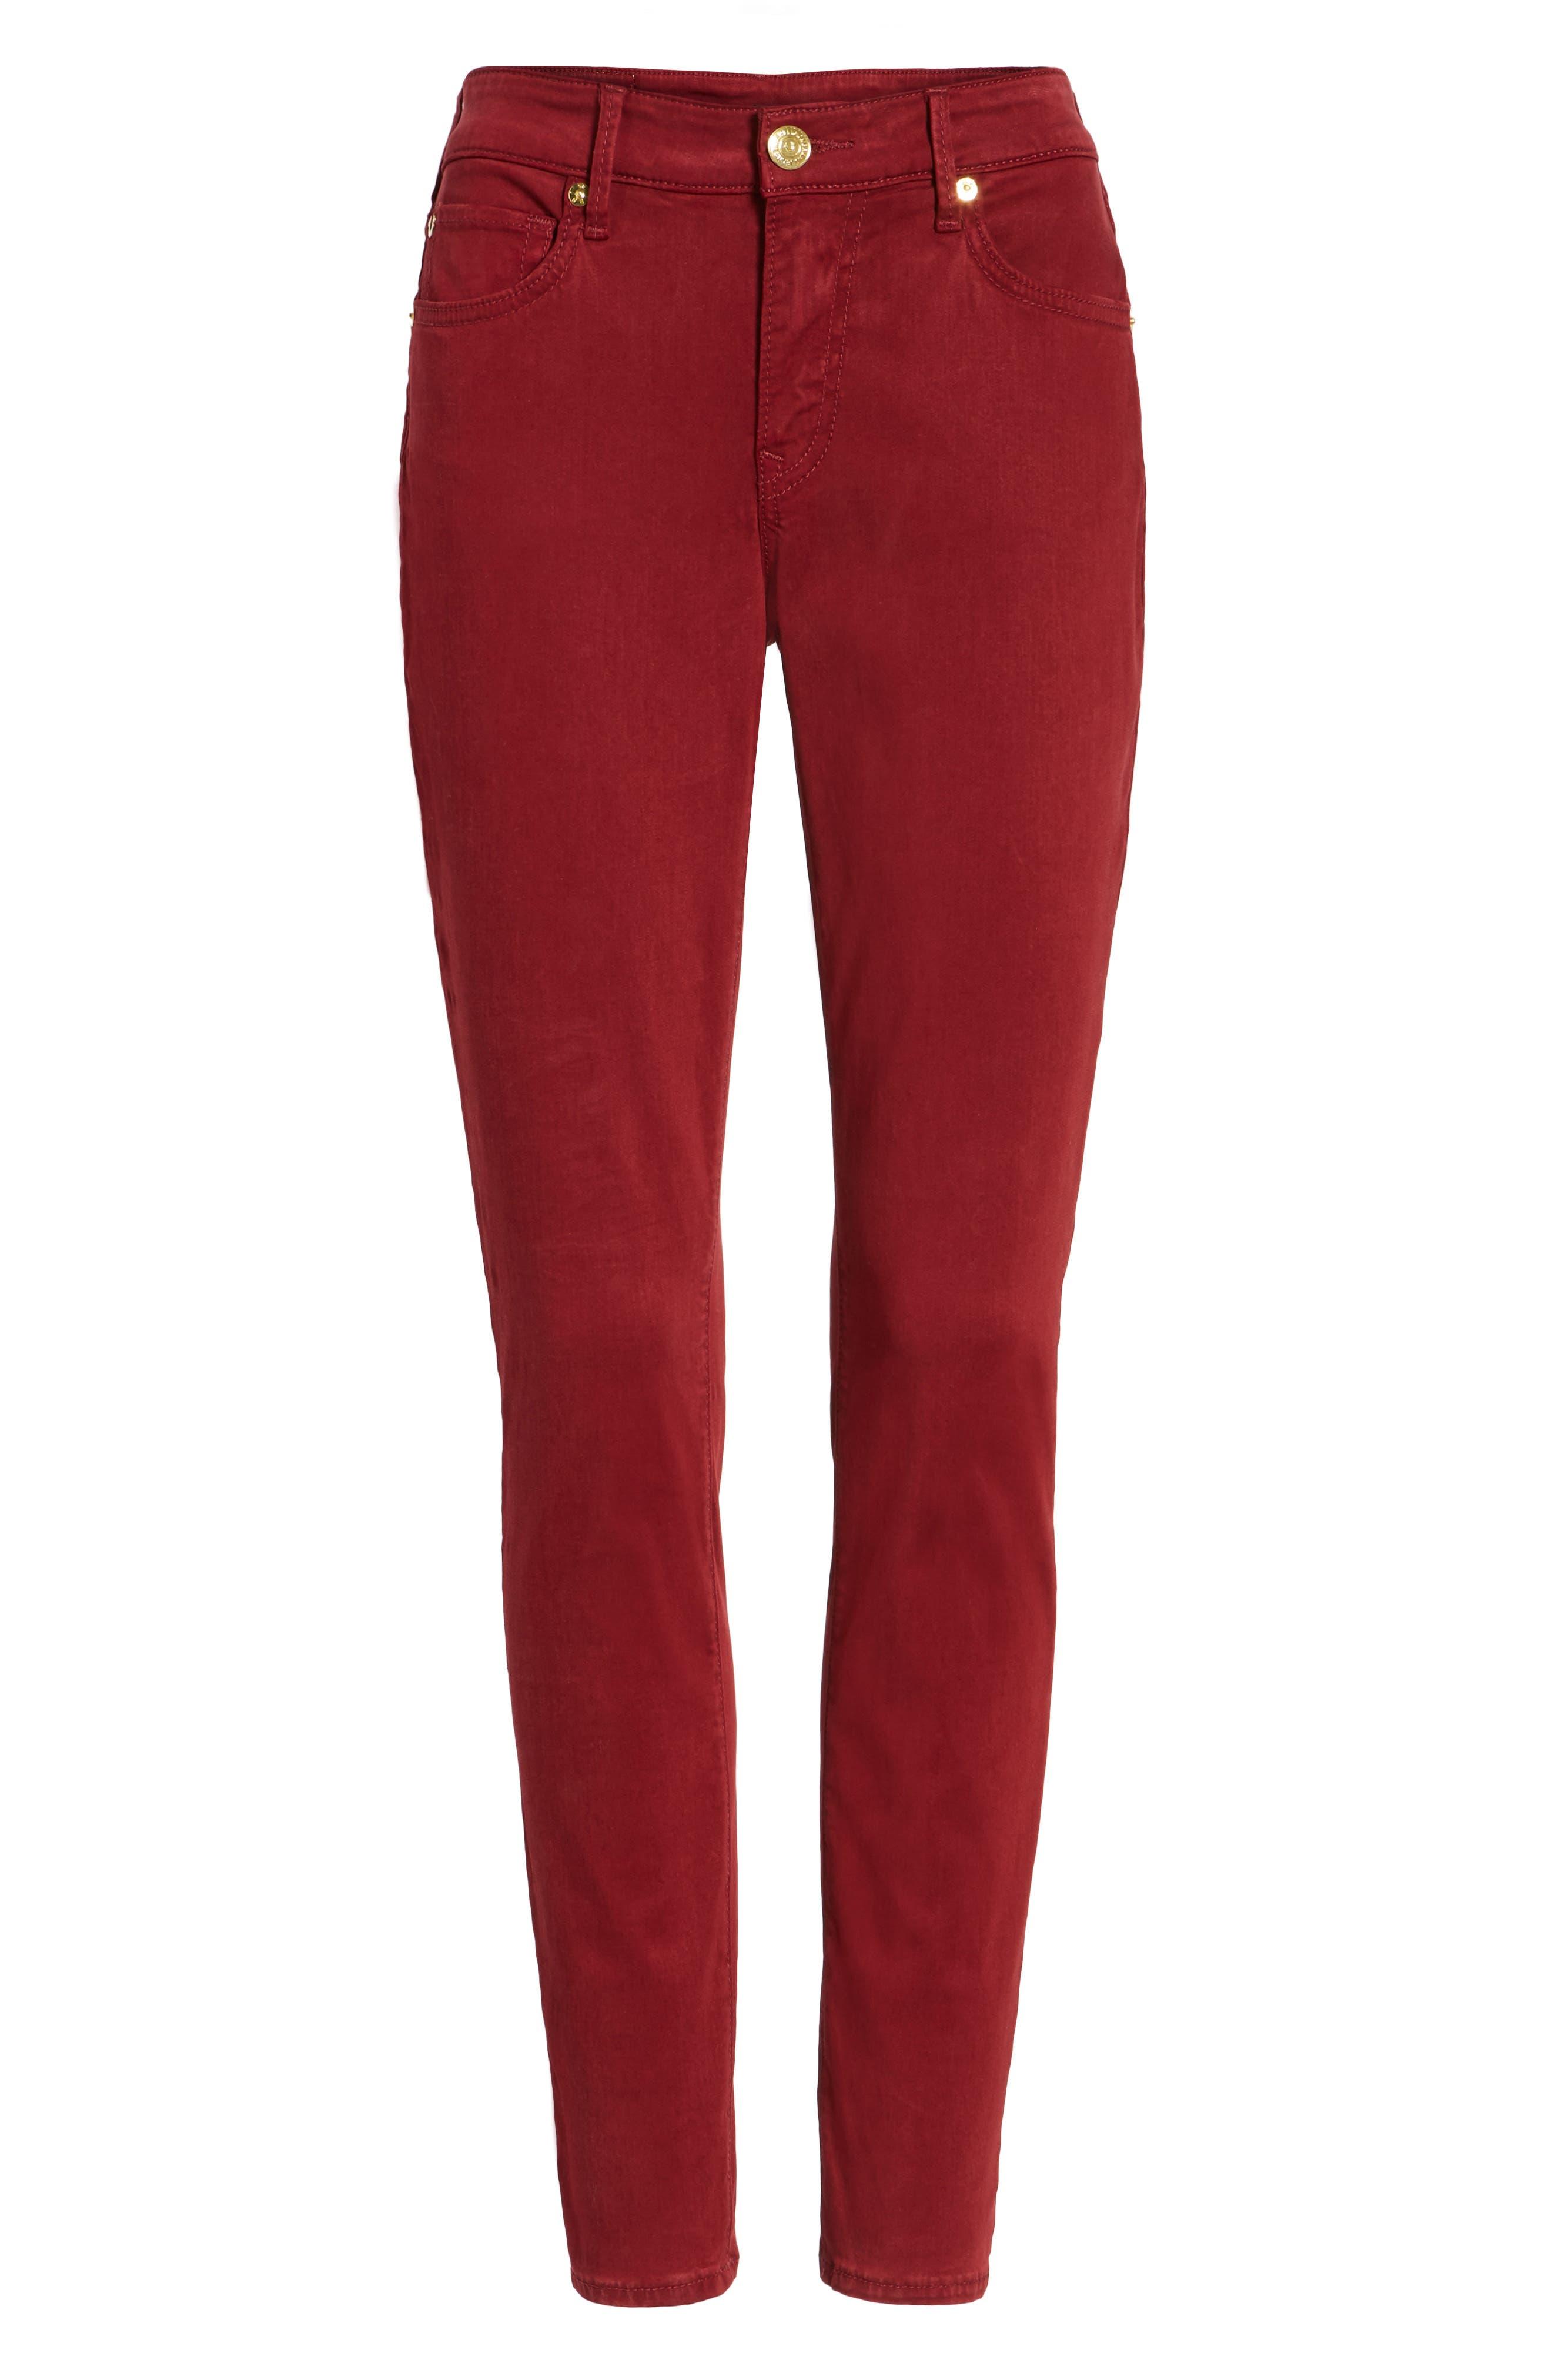 Jennie Curvy Skinny Jeans,                             Alternate thumbnail 6, color,                             640